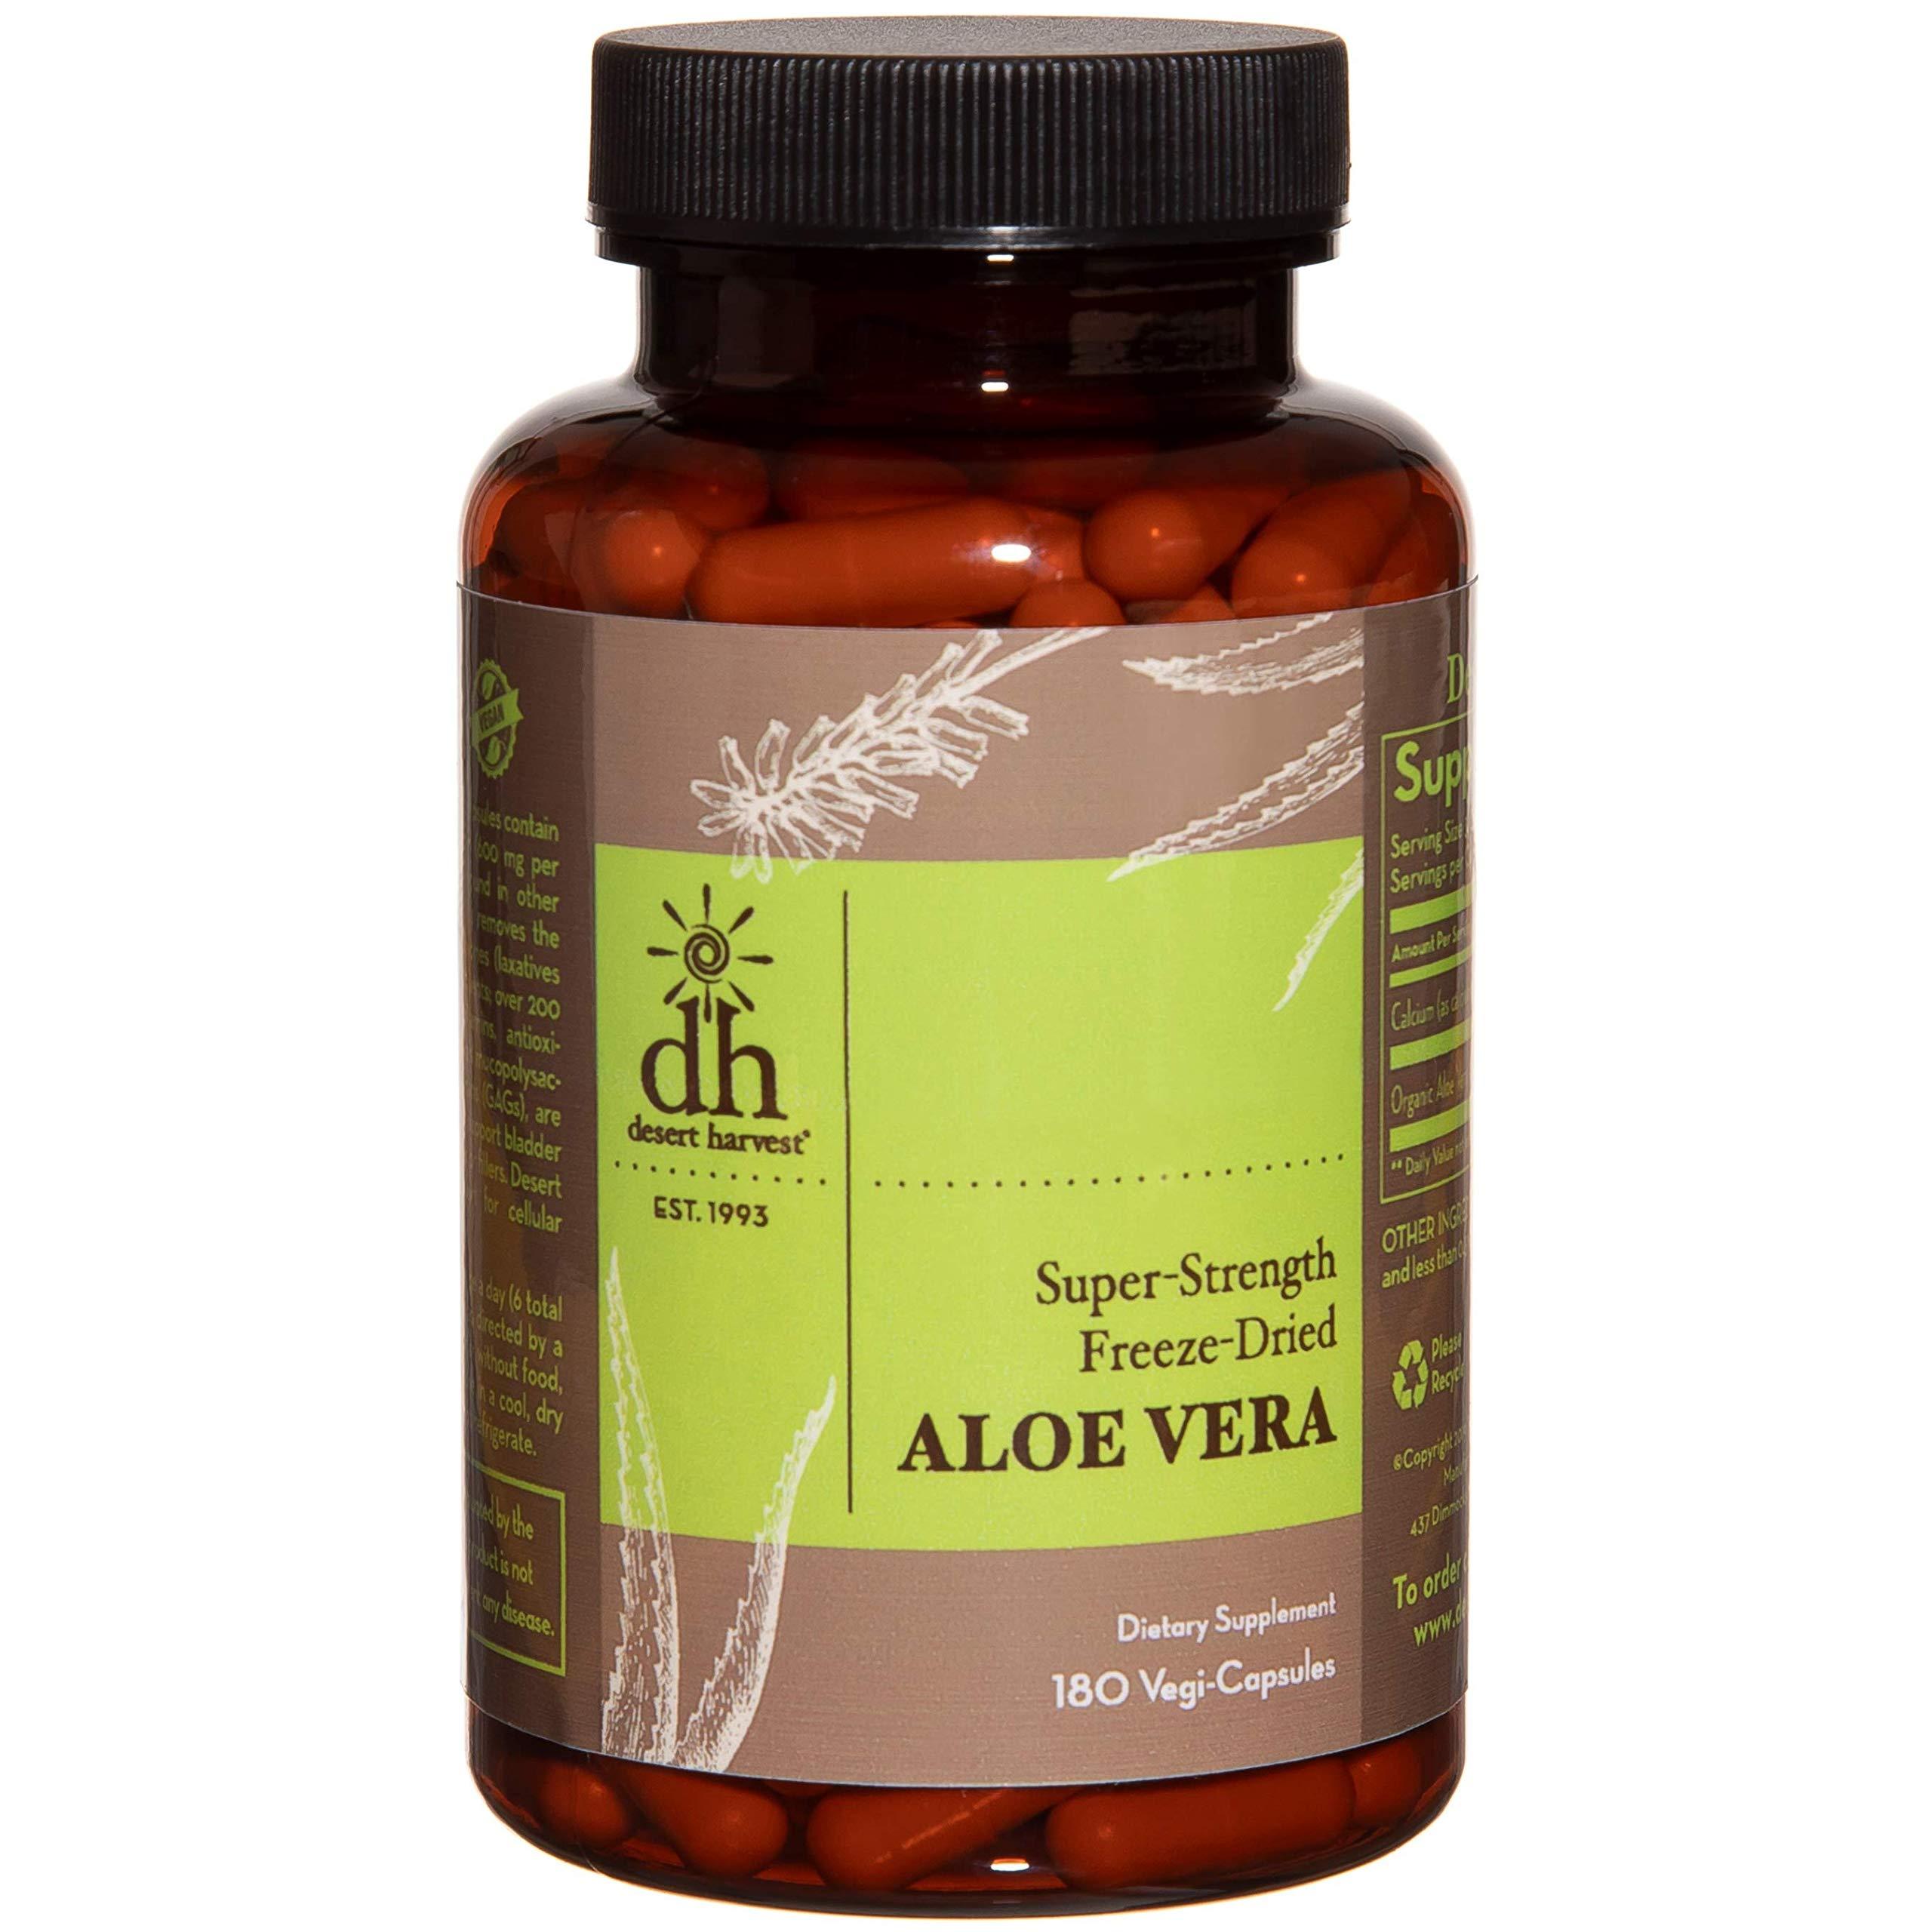 Desert Harvest Super-Strength 100% Organic Aloe Vera Supplement (180 Capsules), 600 milligrams containing 200 milligrams Active Ingredients Each. Interstitial Cystitis & Painful Bladder Relief by Desert Harvest